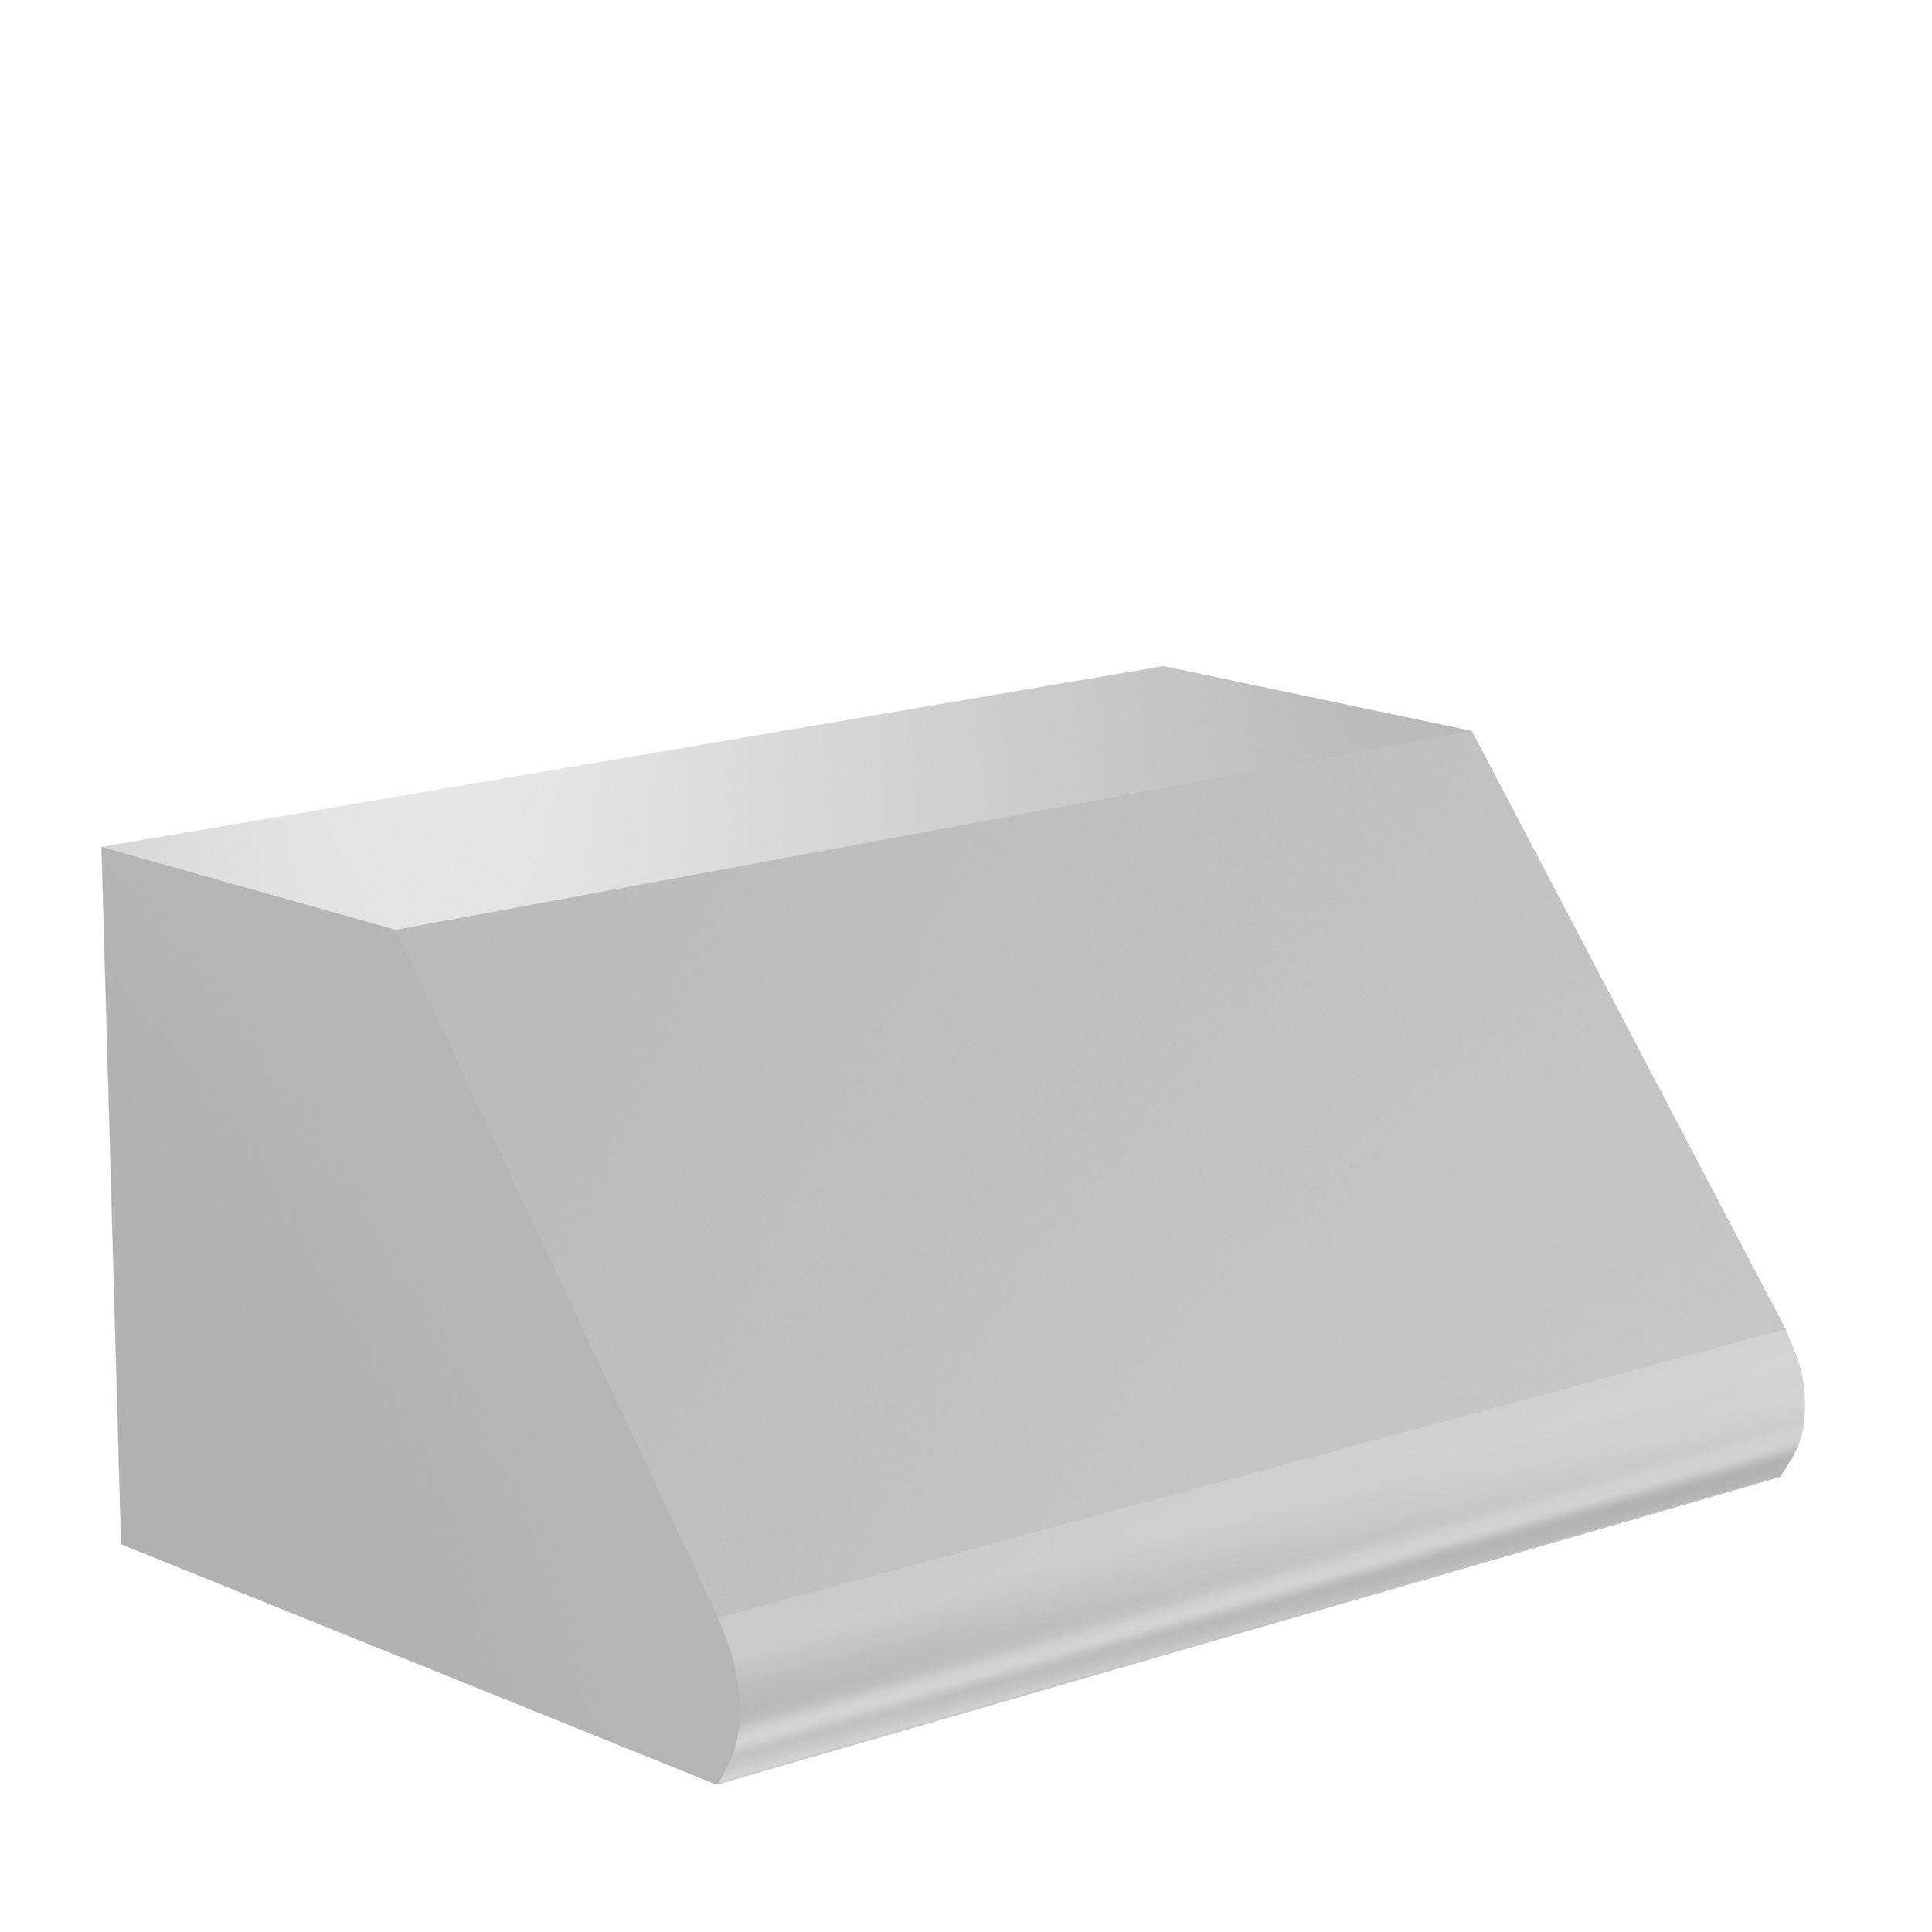 zline-stainless-steel-under-cabinet-range-hood-527-top.jpeg